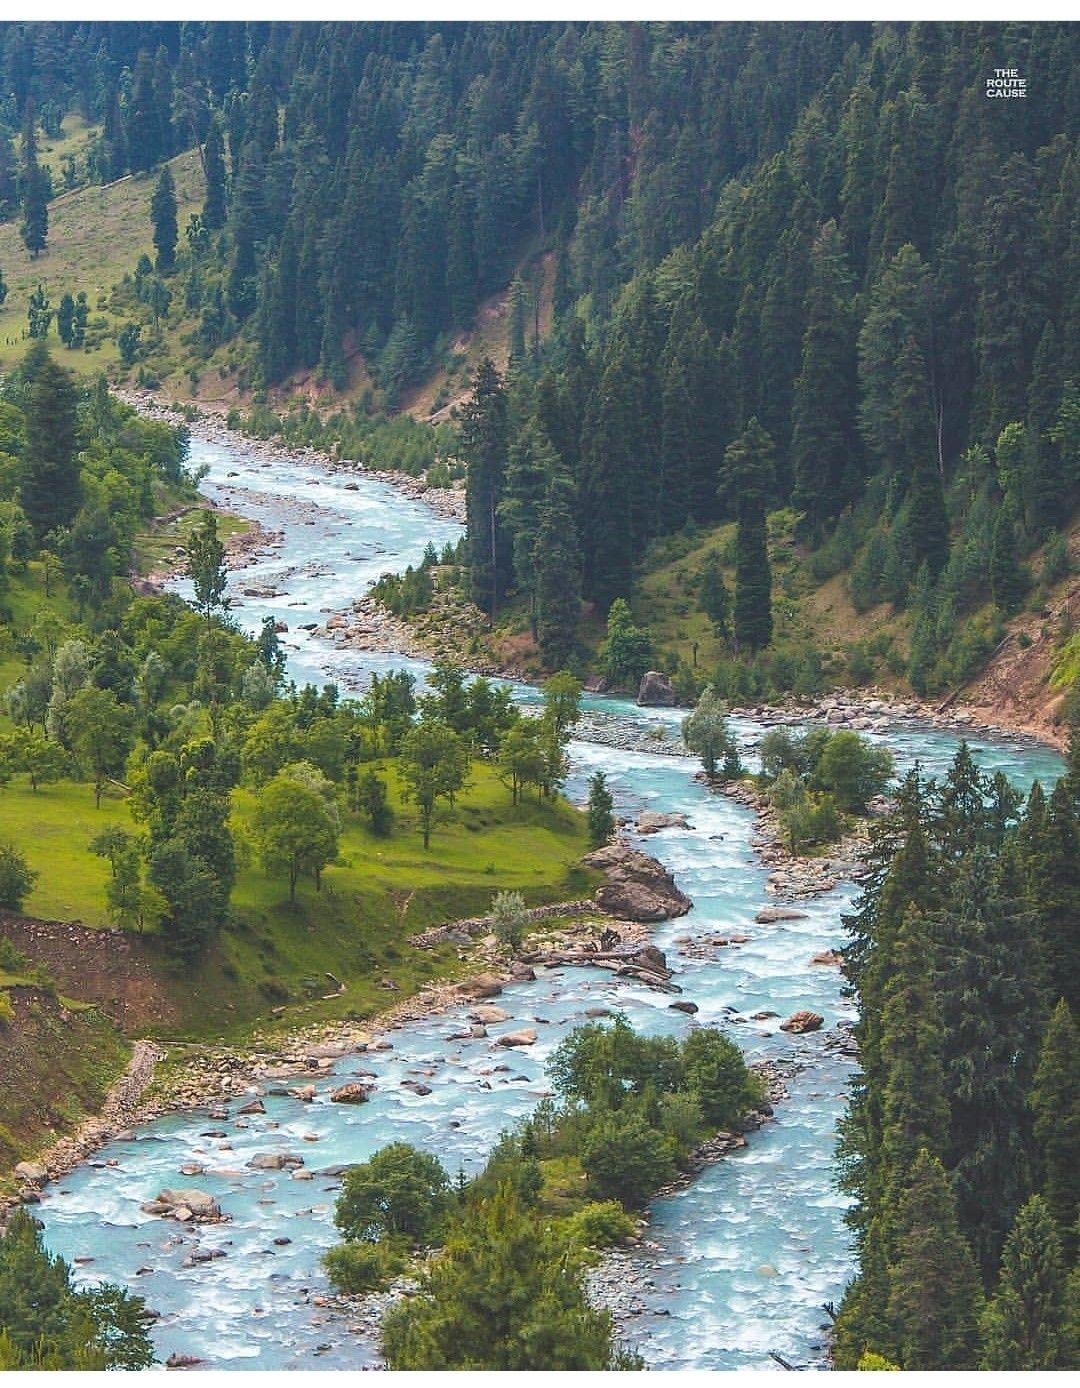 Kashmir Nature Scenery Landscape